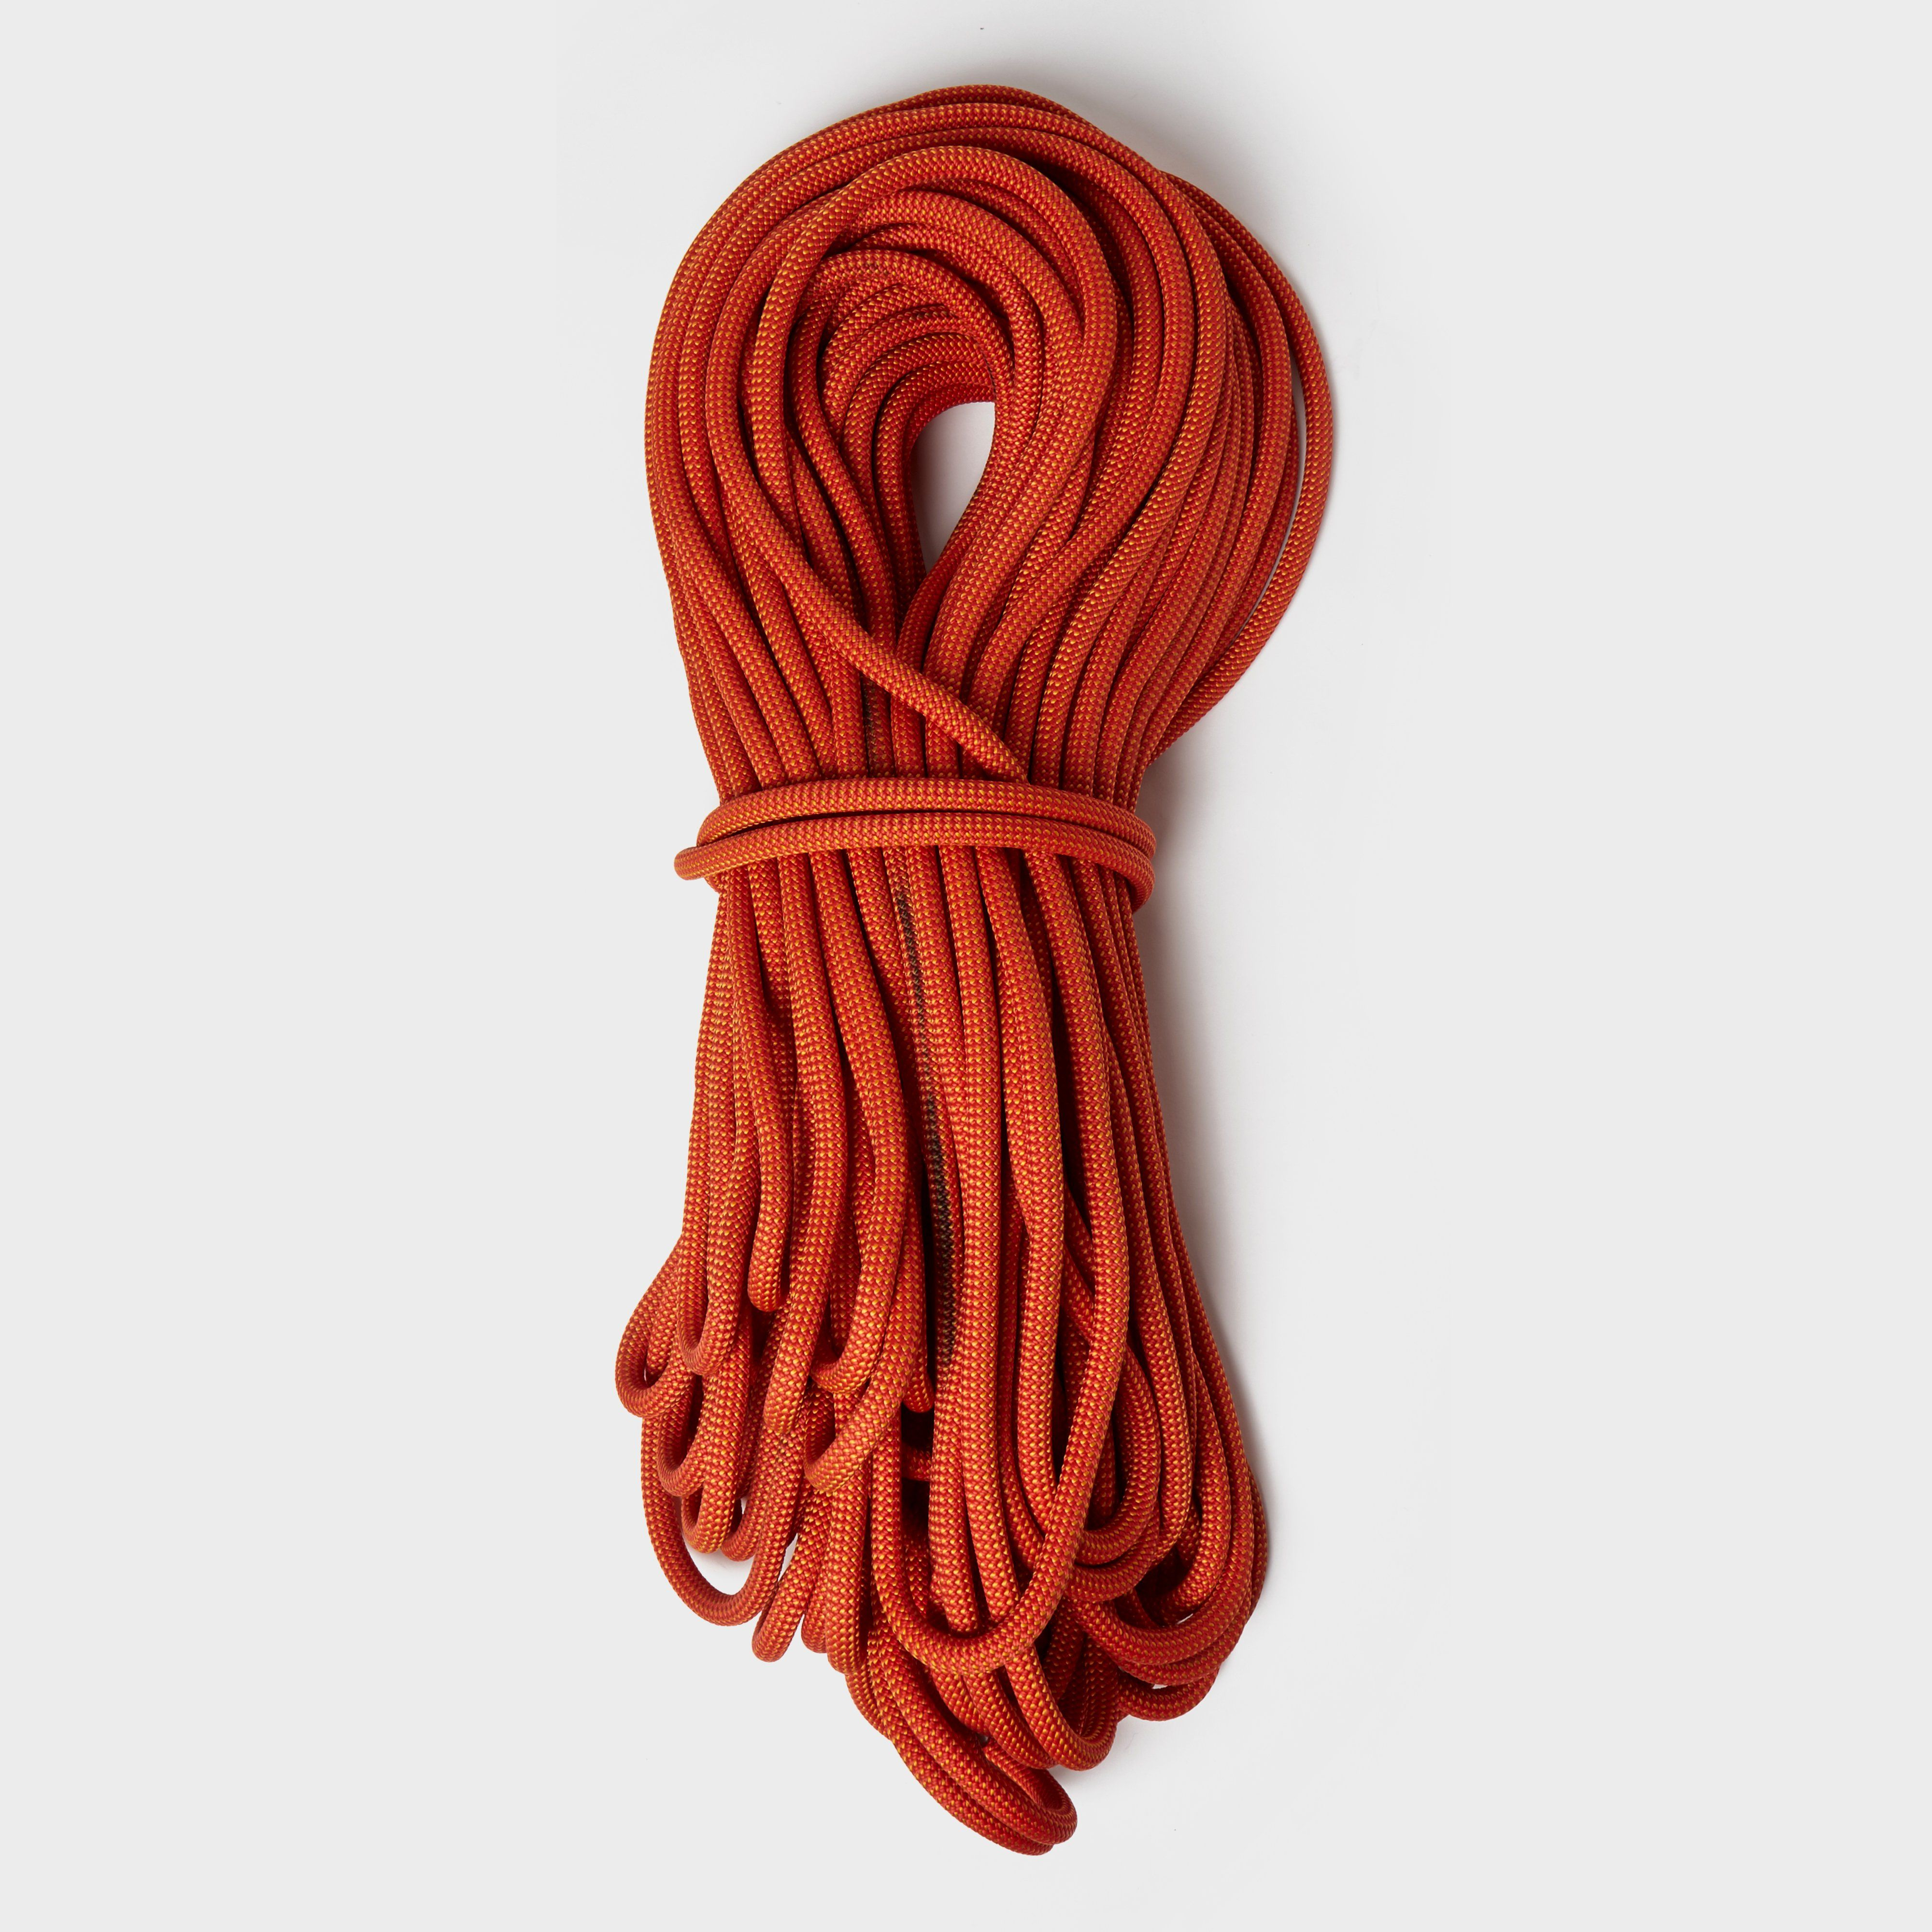 PETZL Arial® 9.5mm Climbing Rope 60m